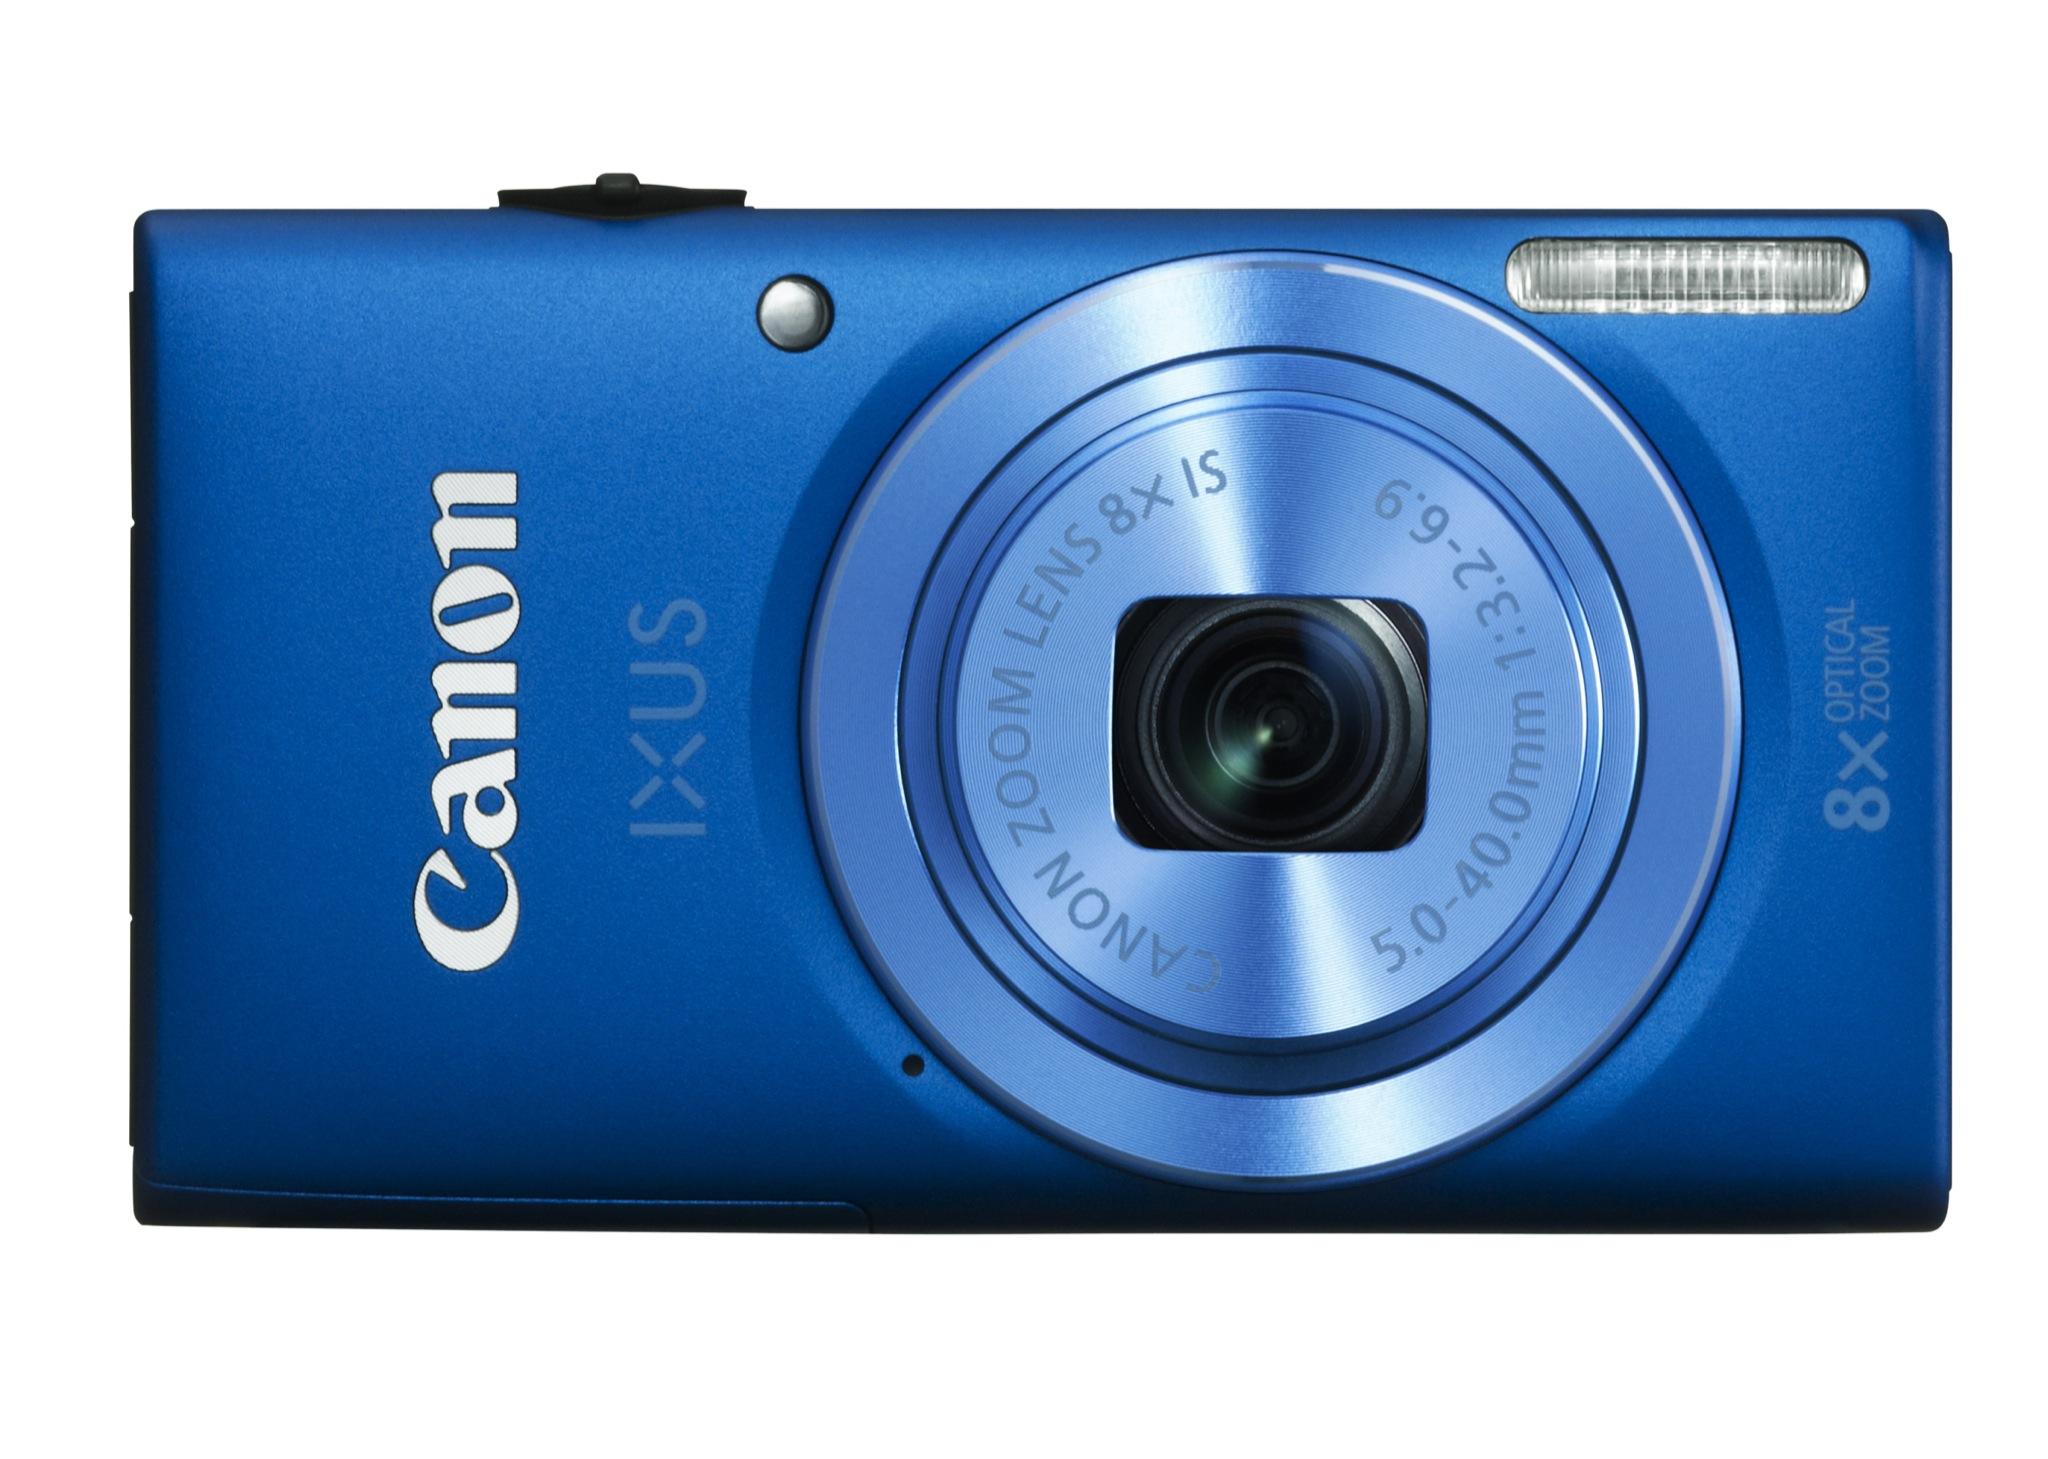 Canon: Neue Ixus-Kameras ab 140 Euro - Canon Ixus 135 (Bild: Canon)